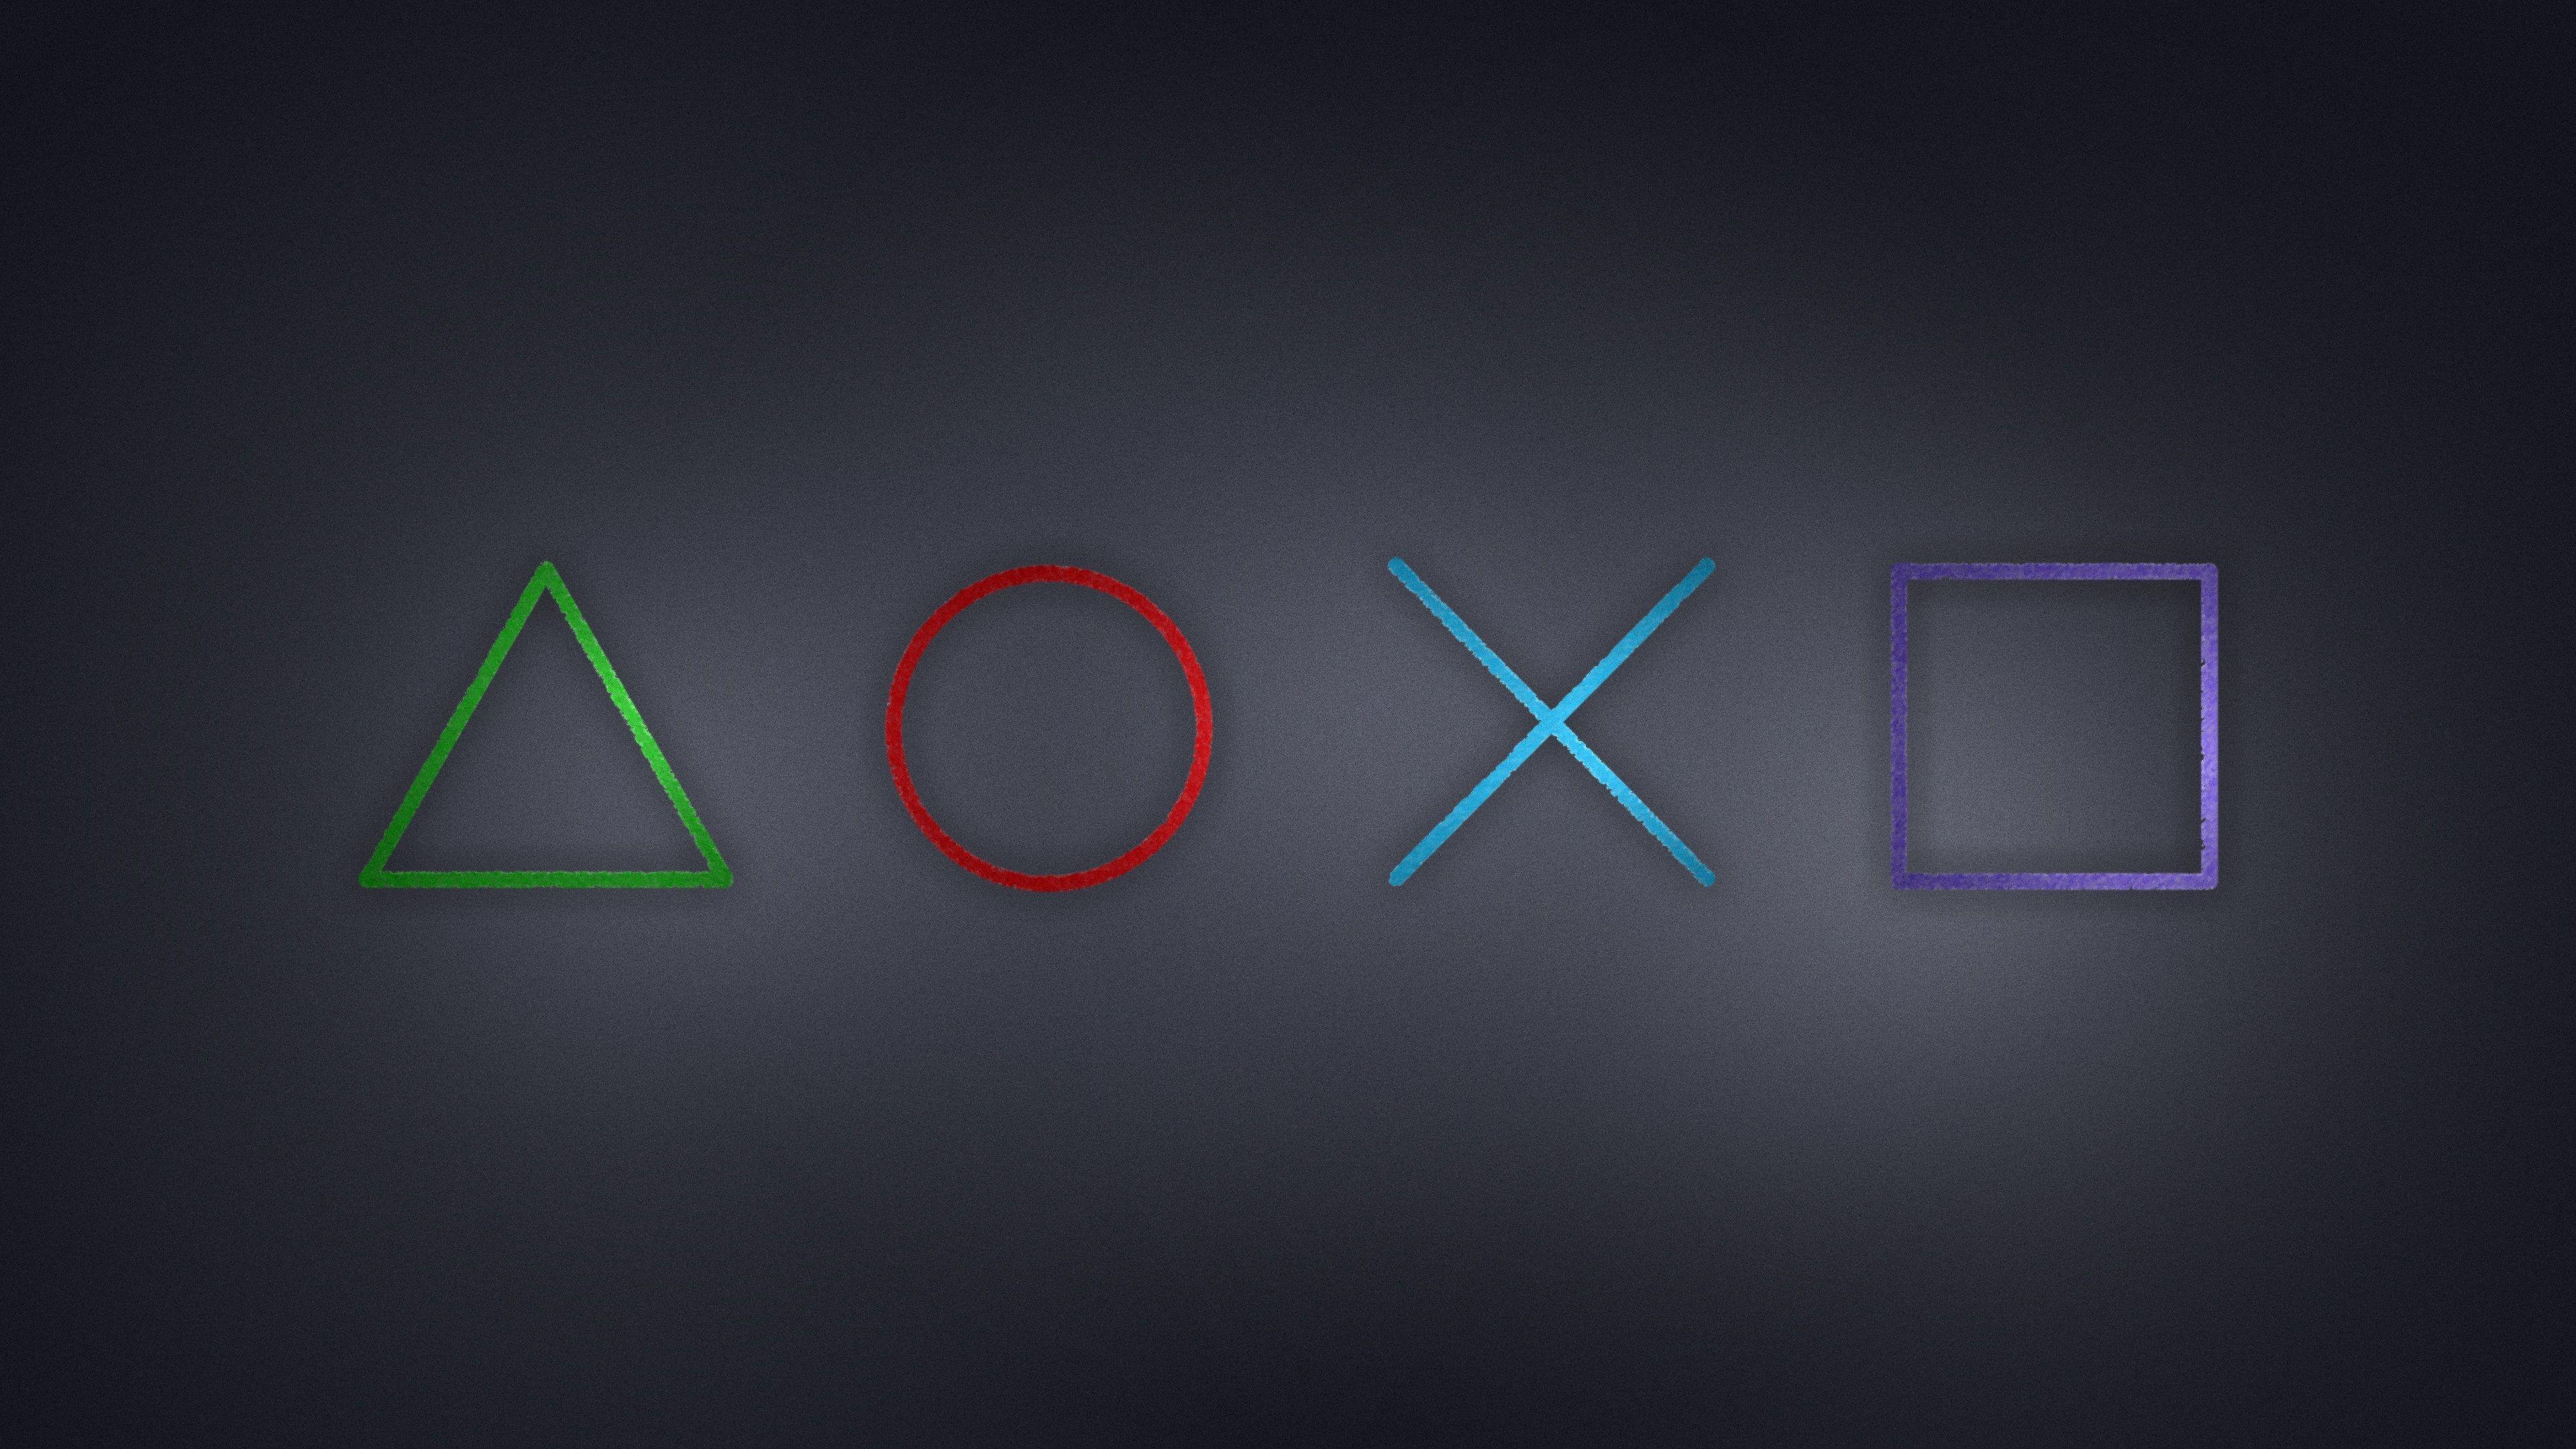 Playstation 4 Logo 4k , HD Wallpaper & Backgrounds